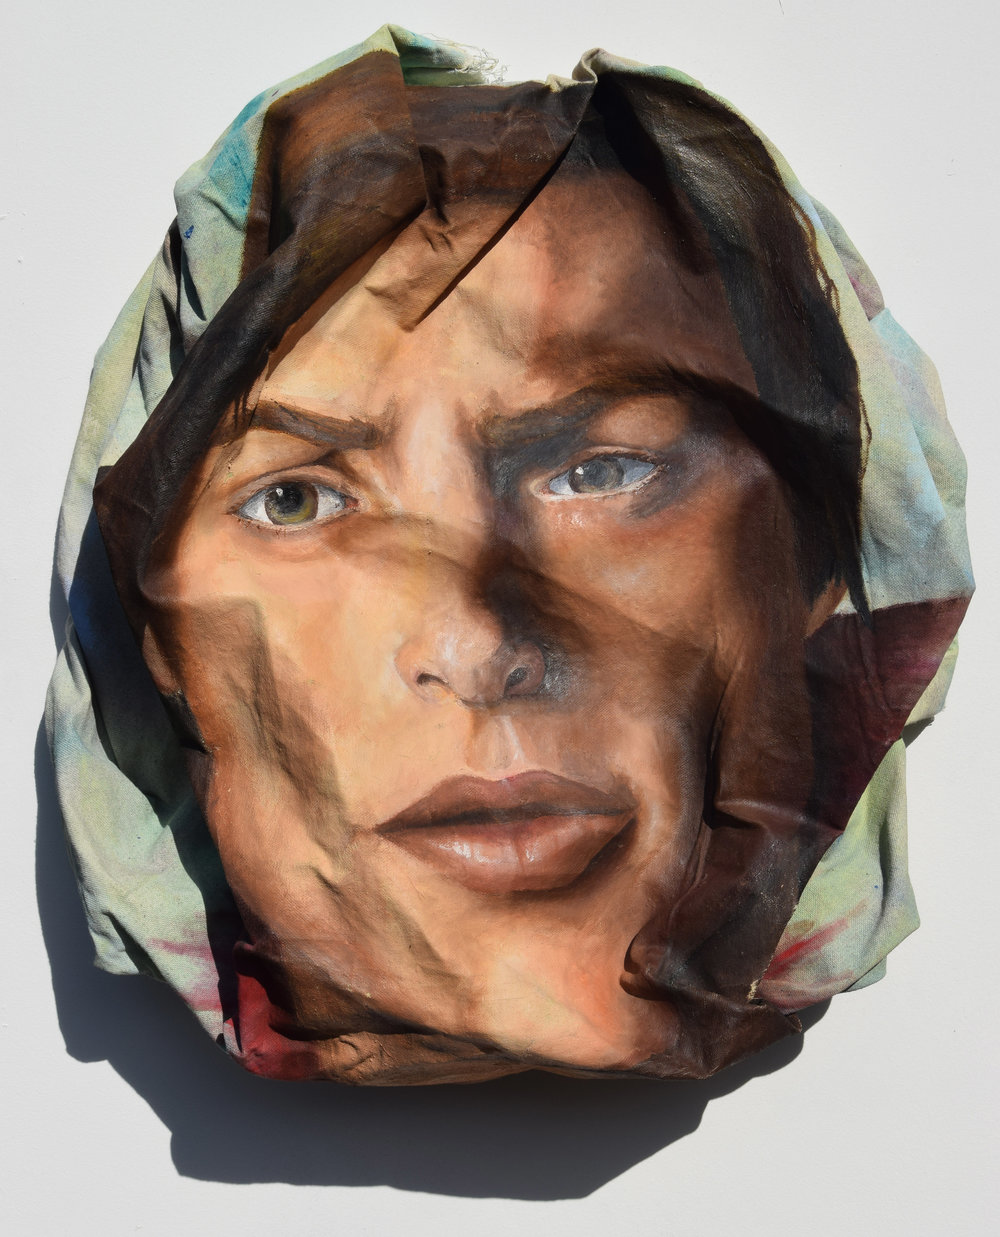 Unmasked man, 2015 54 x 54 cm £600